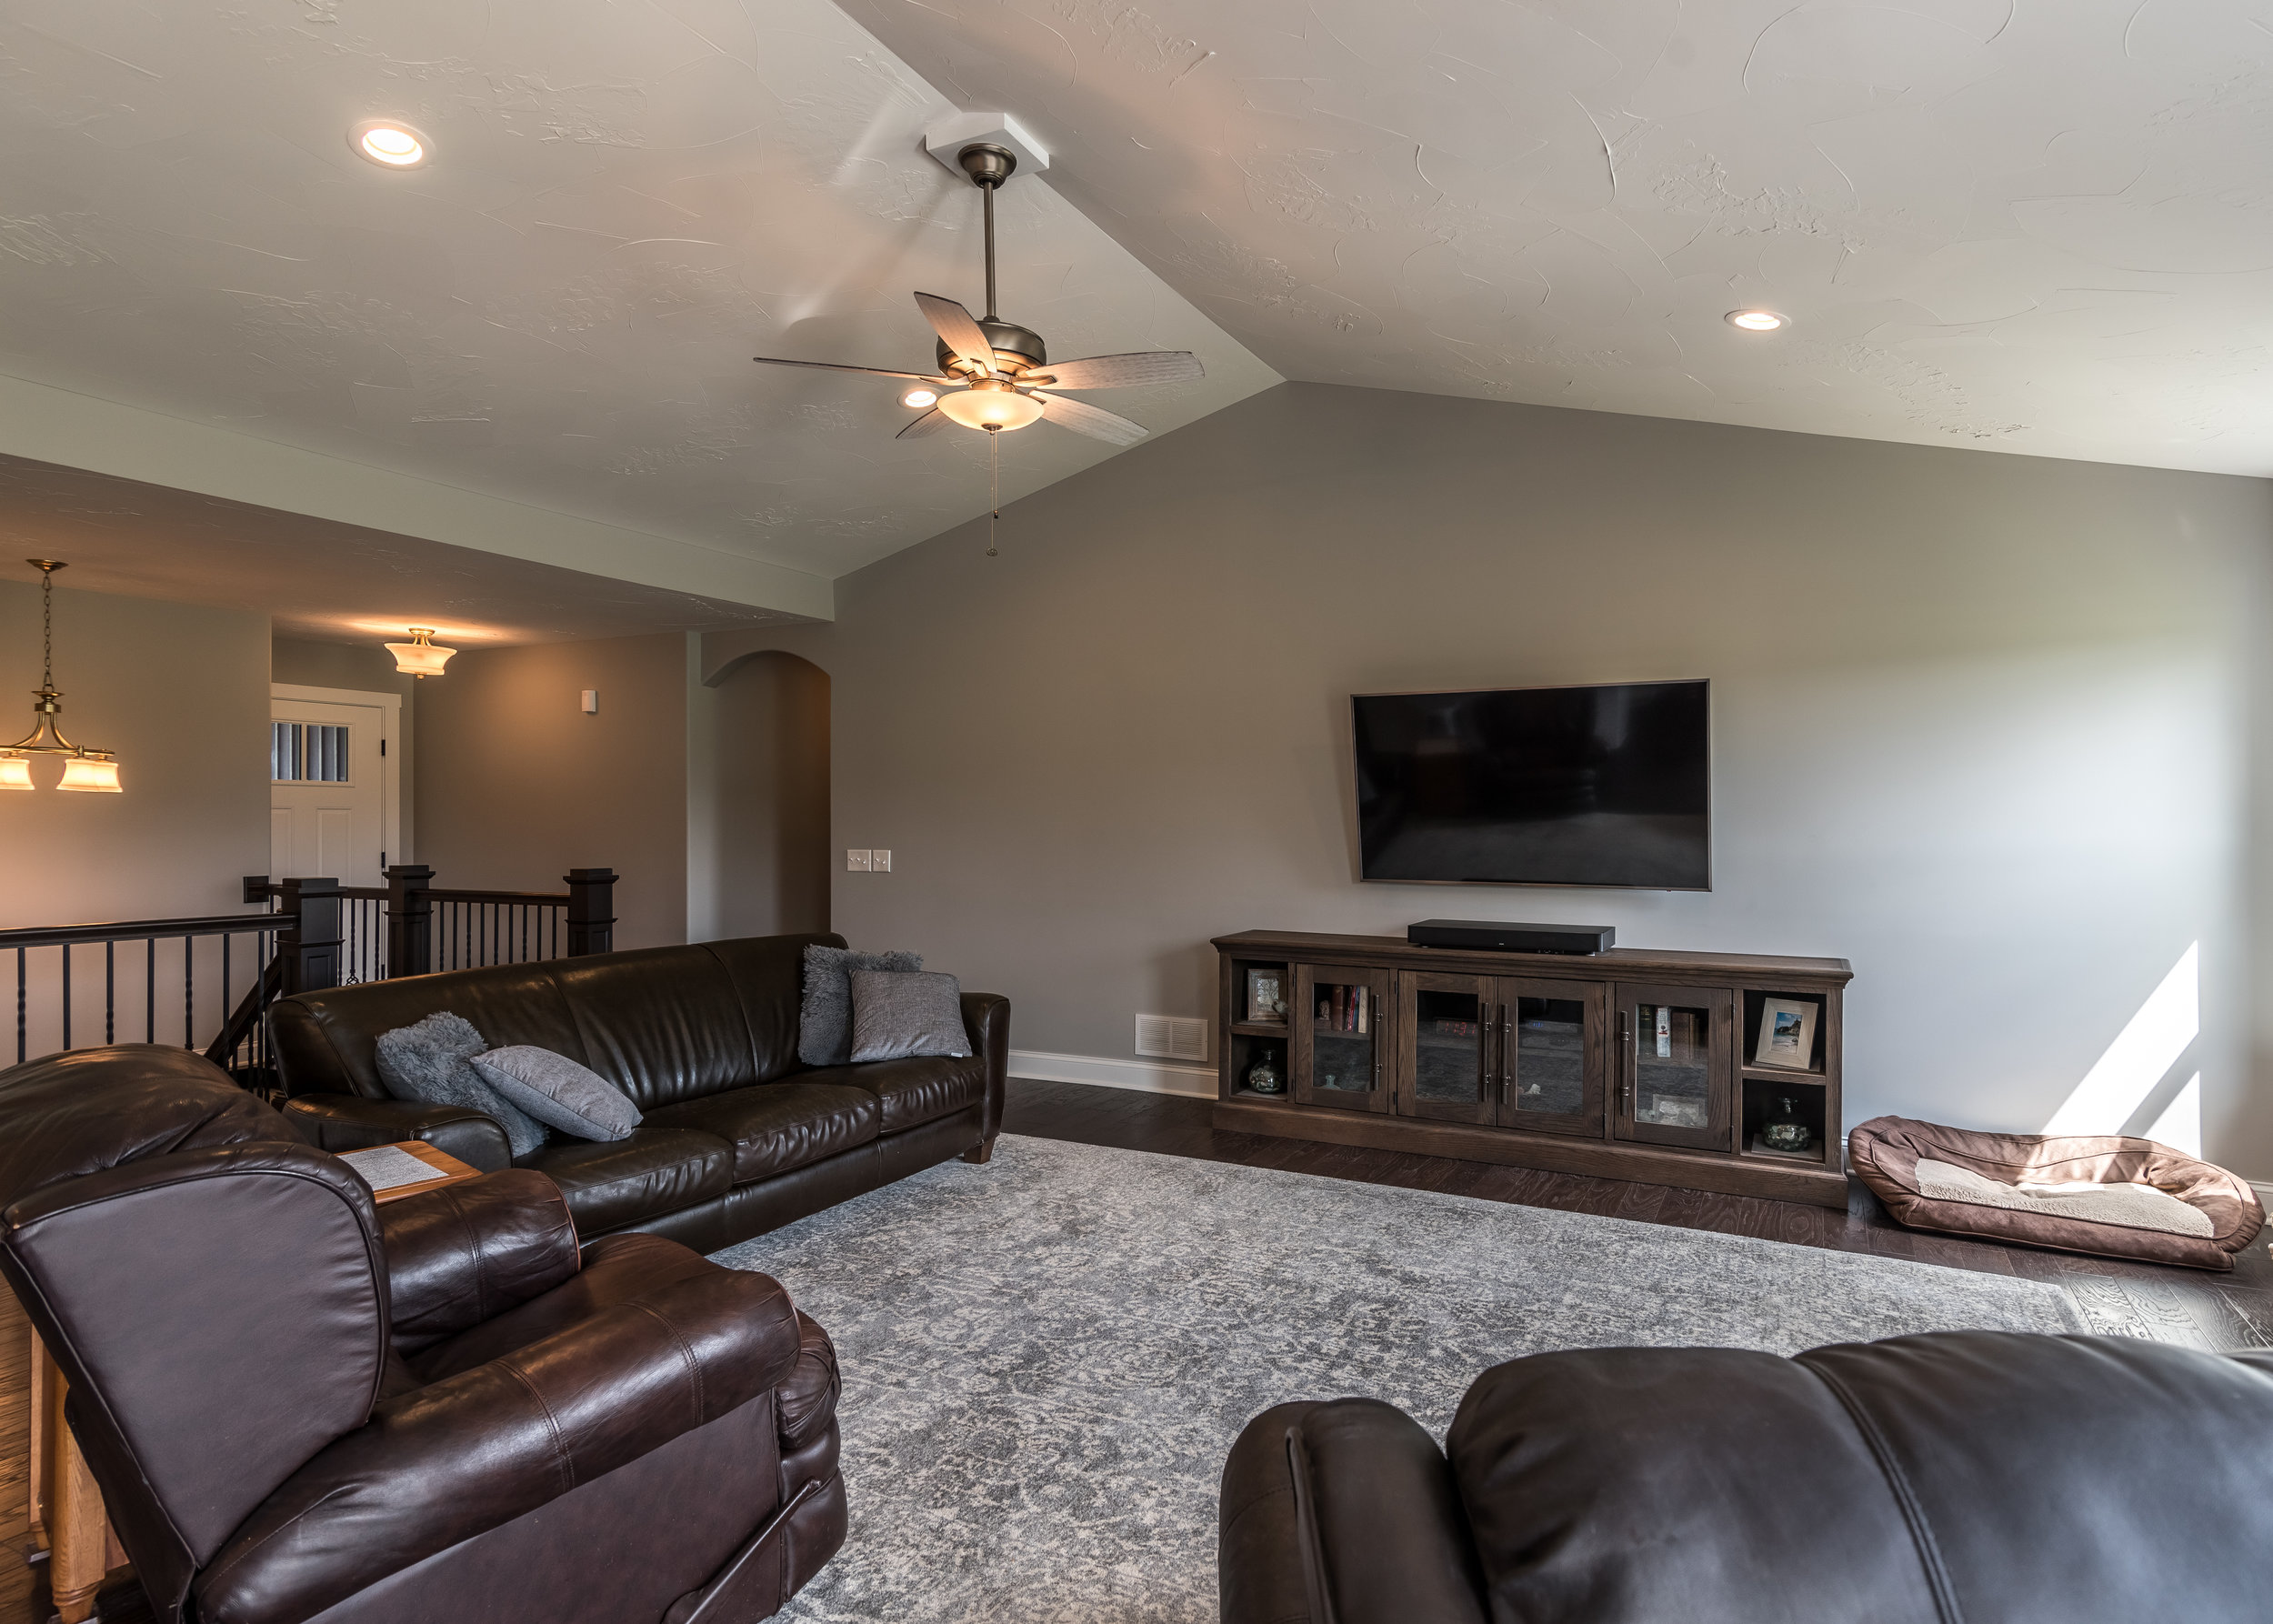 PH_Design_and_construction_skipper_livingroom